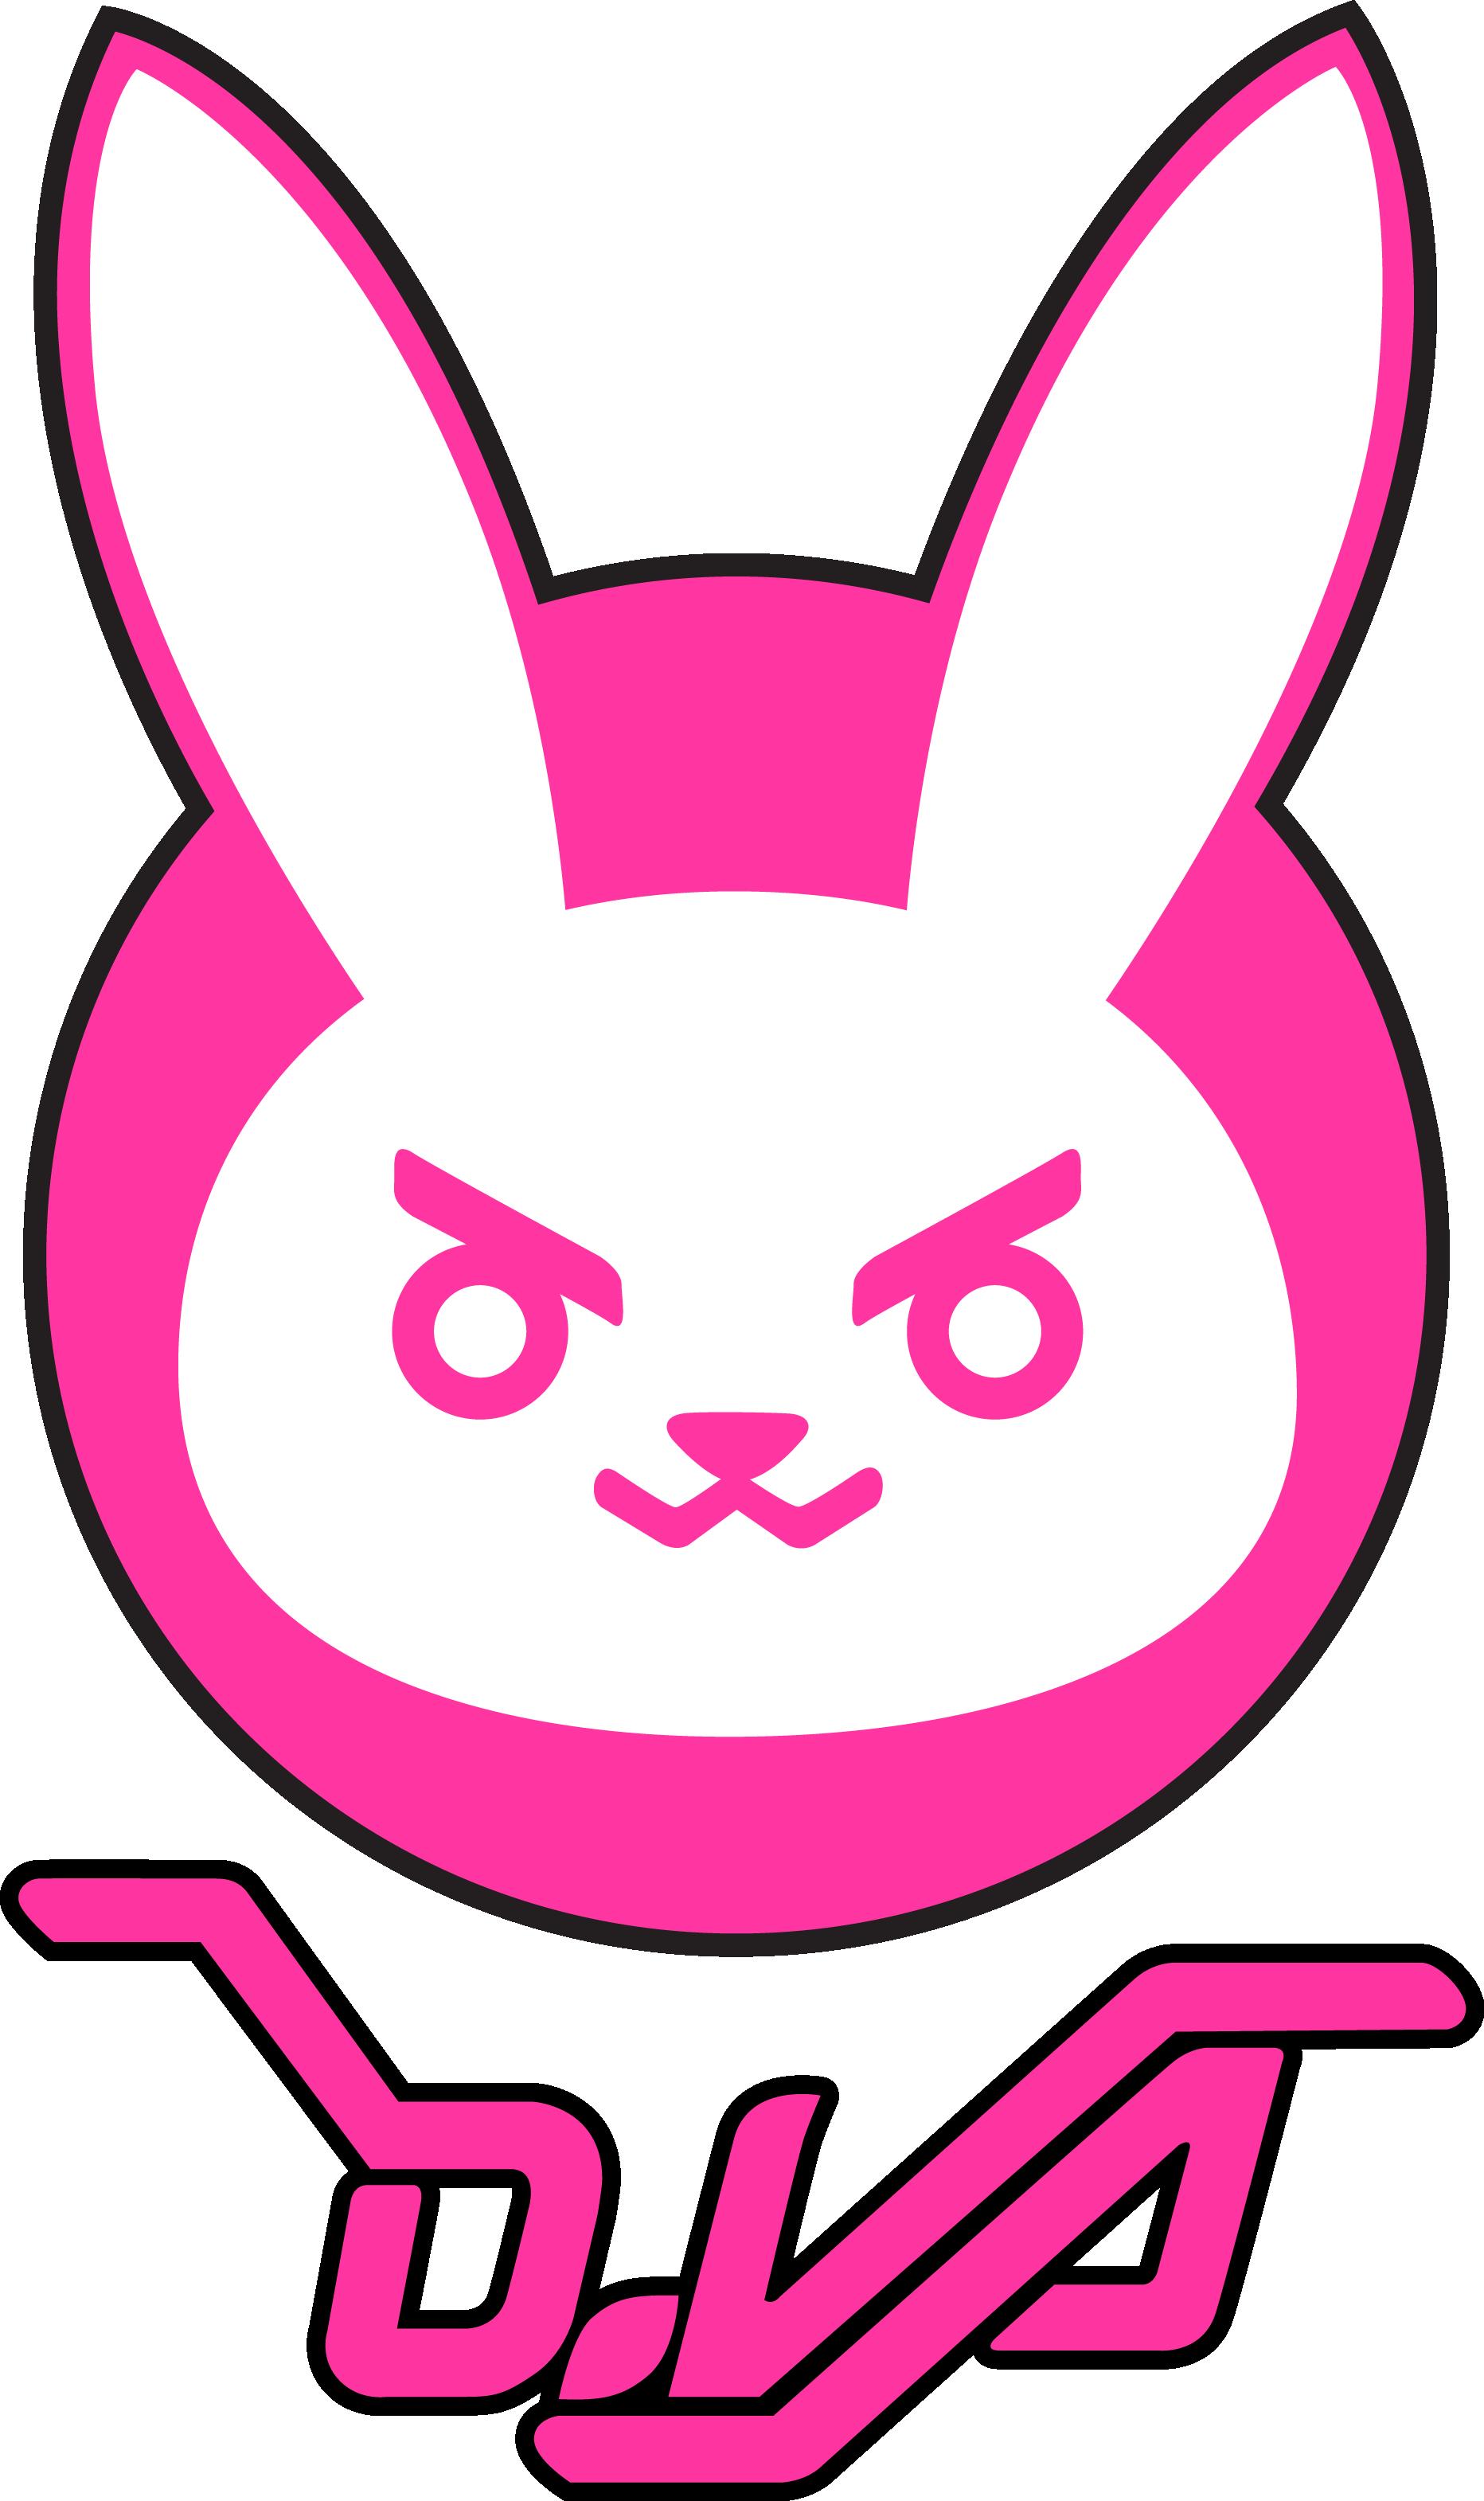 Dva Bunny Logo By Deeptriviality Da3x98r Png 1864 3141 Bunny Logo Overwatch Decor Logos